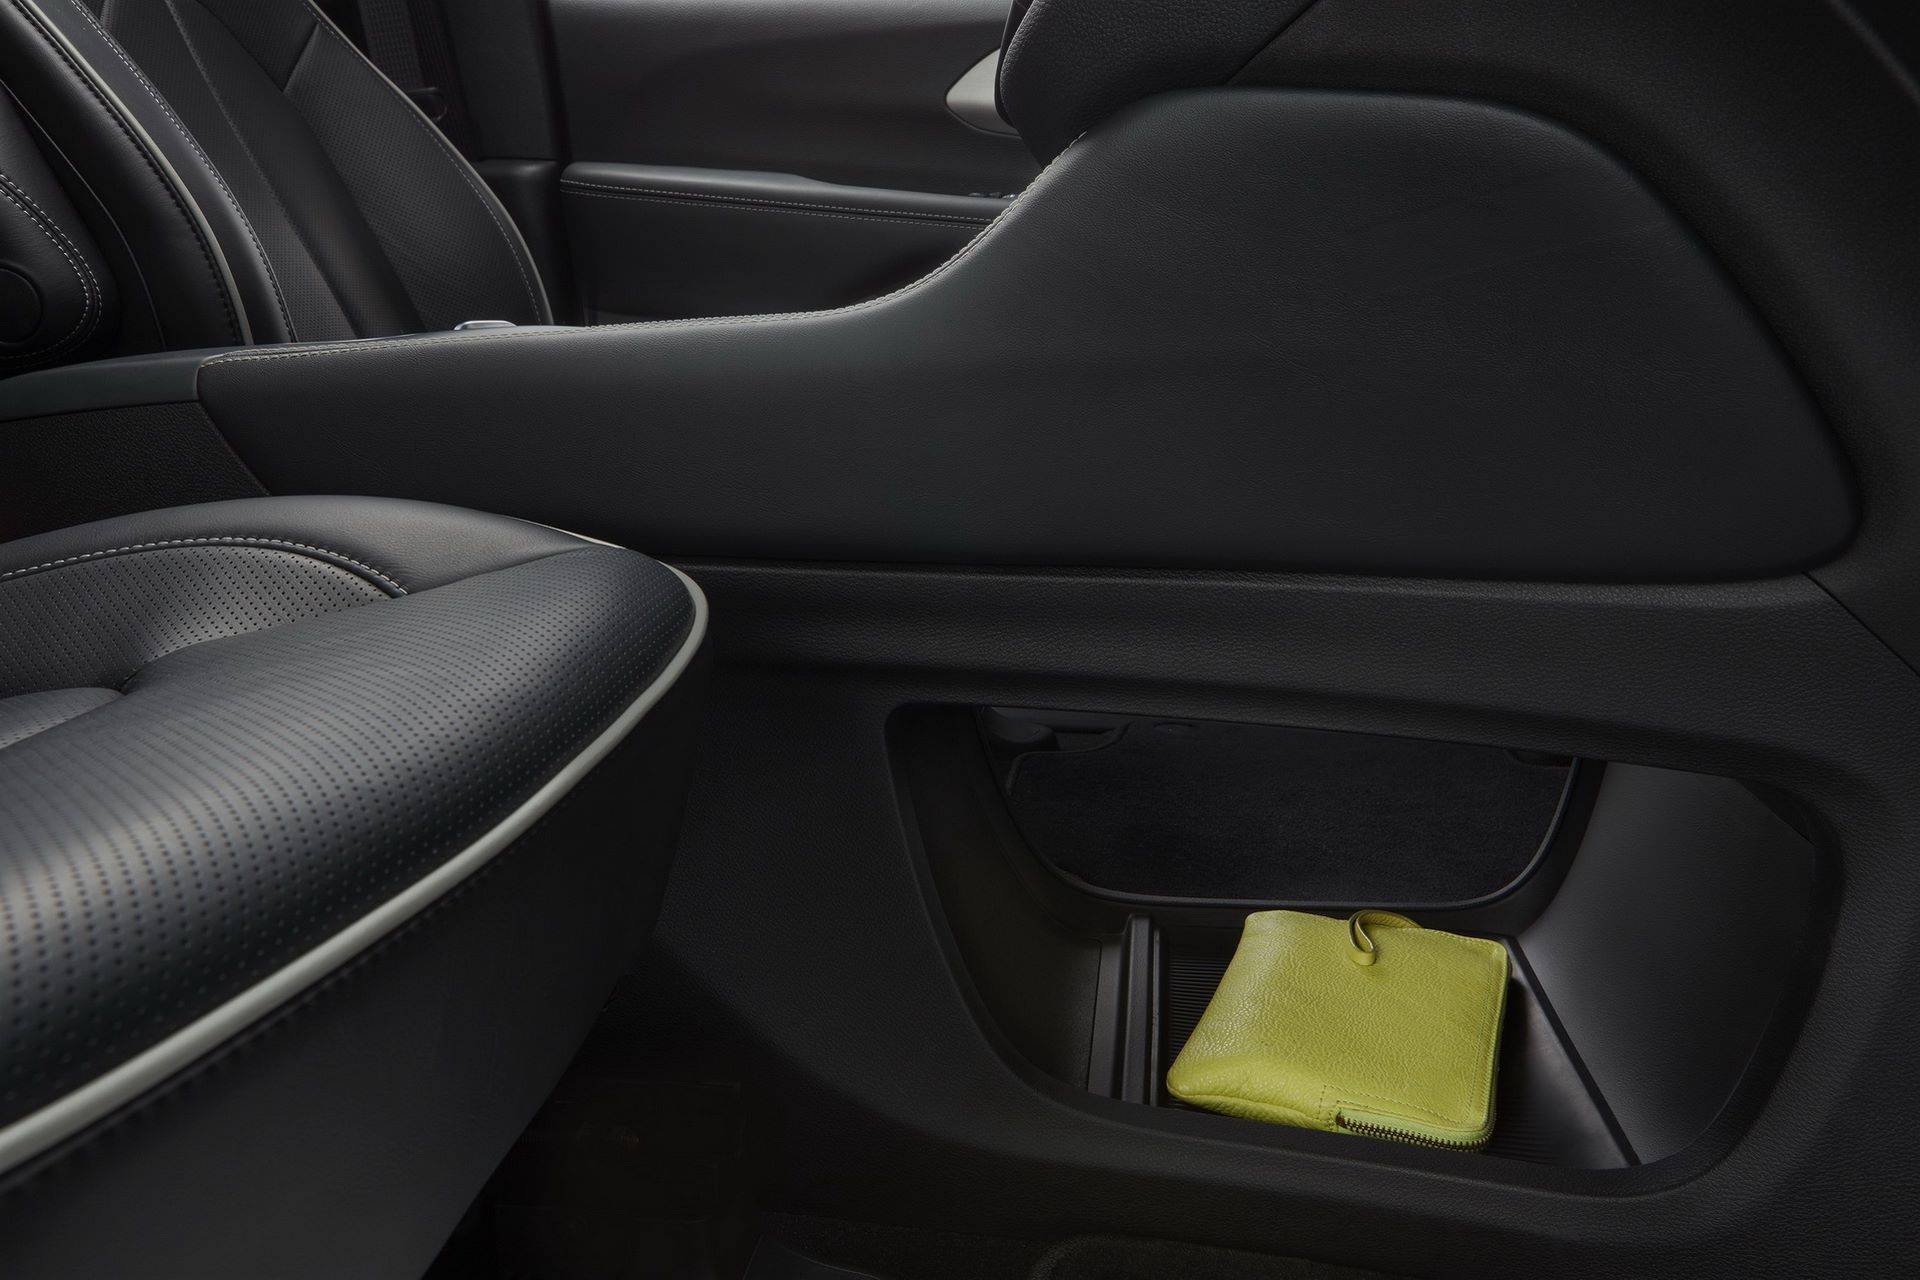 2021-Chrysler-Pacifica-56